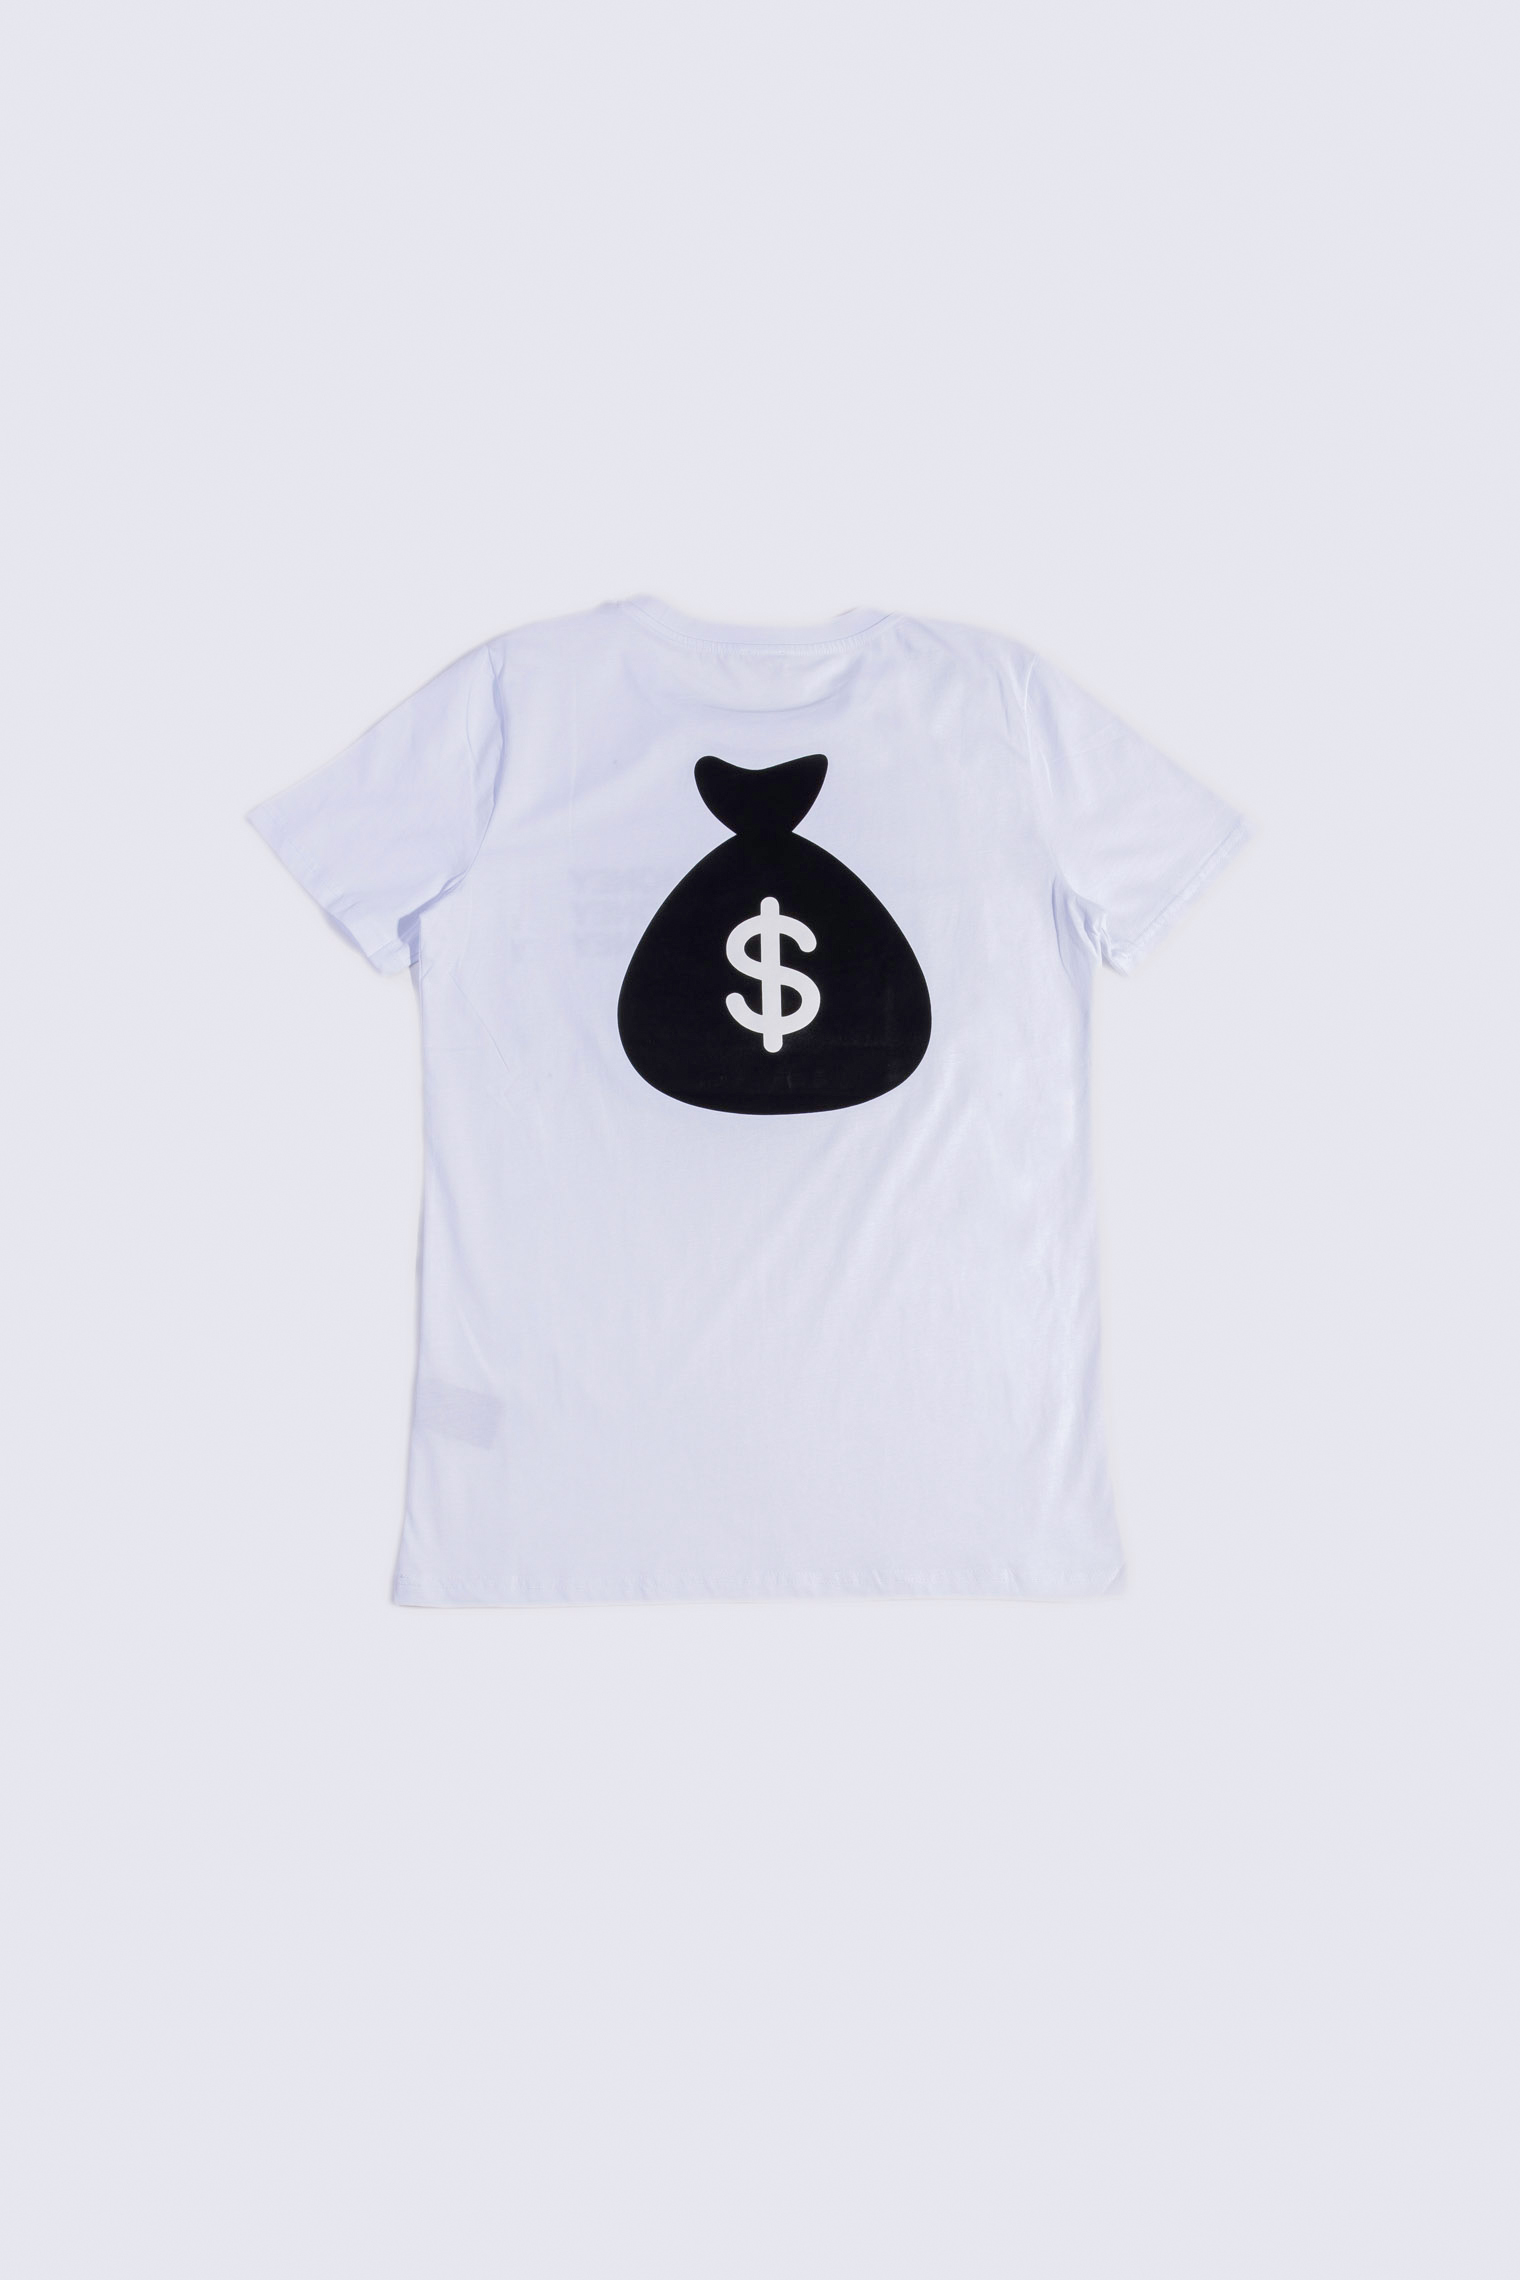 MAKE MONEY NOT FRIENDS T-SHIRT MONEY BIANCO MU171127